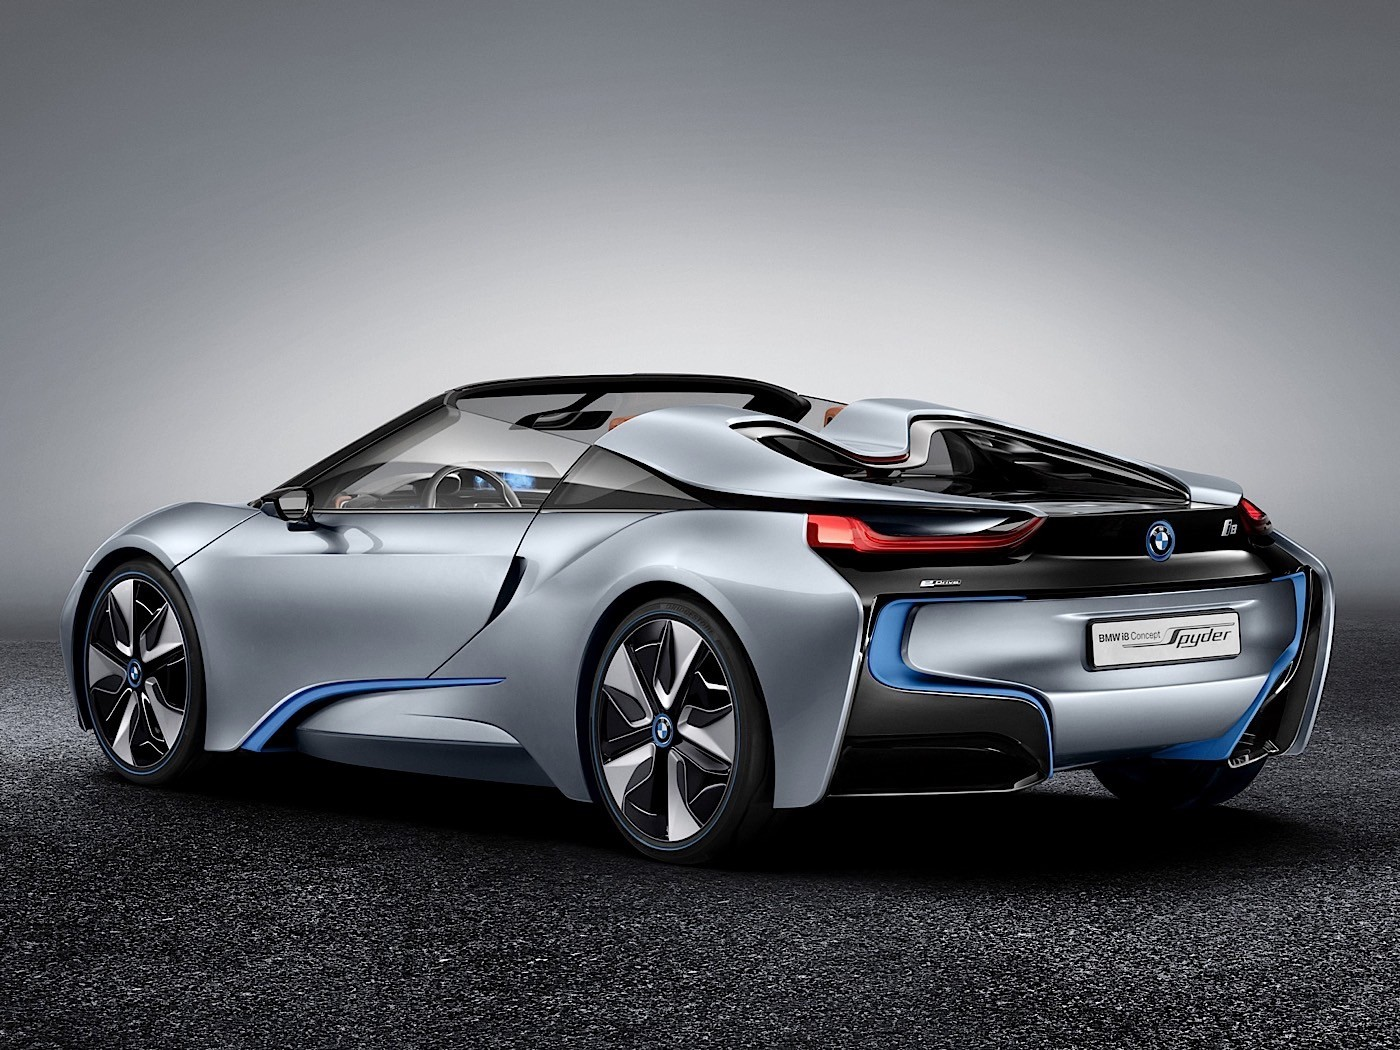 BMW презентует родстер i8 через два года 2